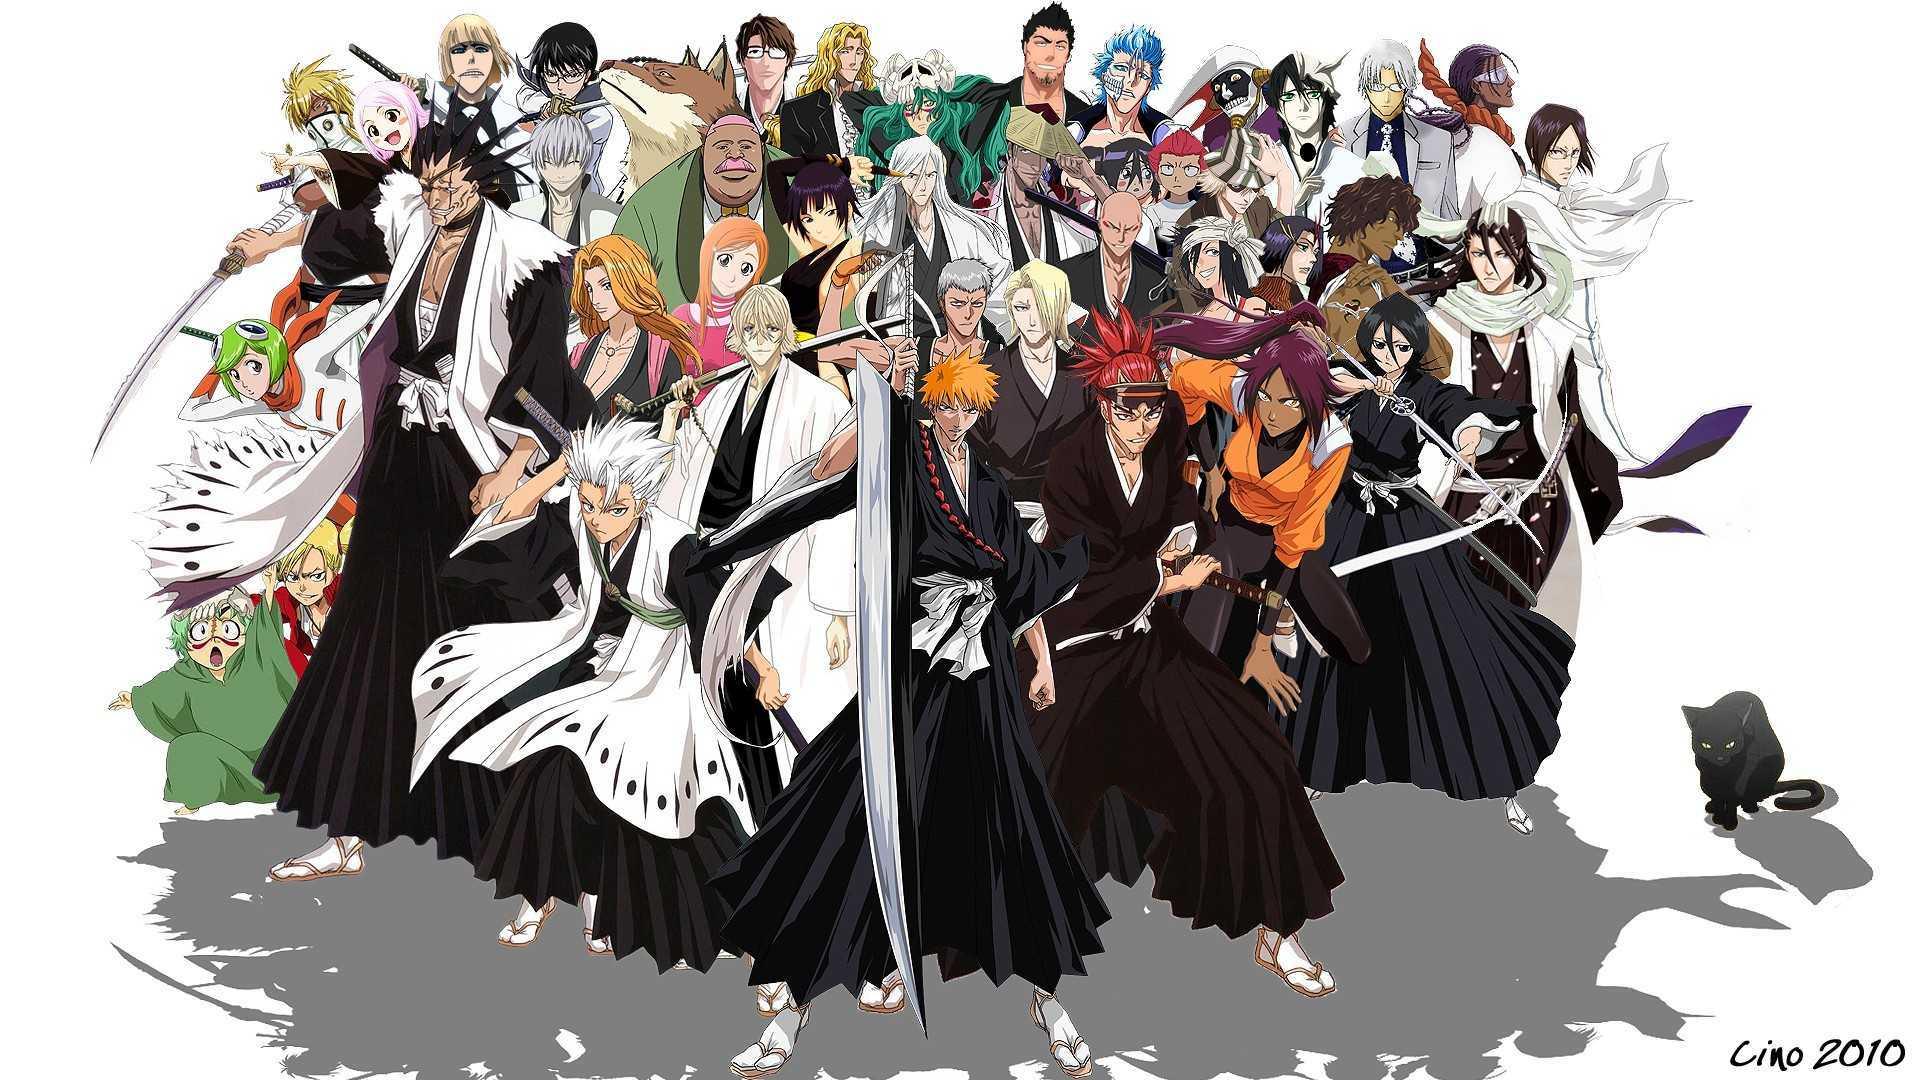 Anime & Manga 4 Bleach Anime Wallpaper All